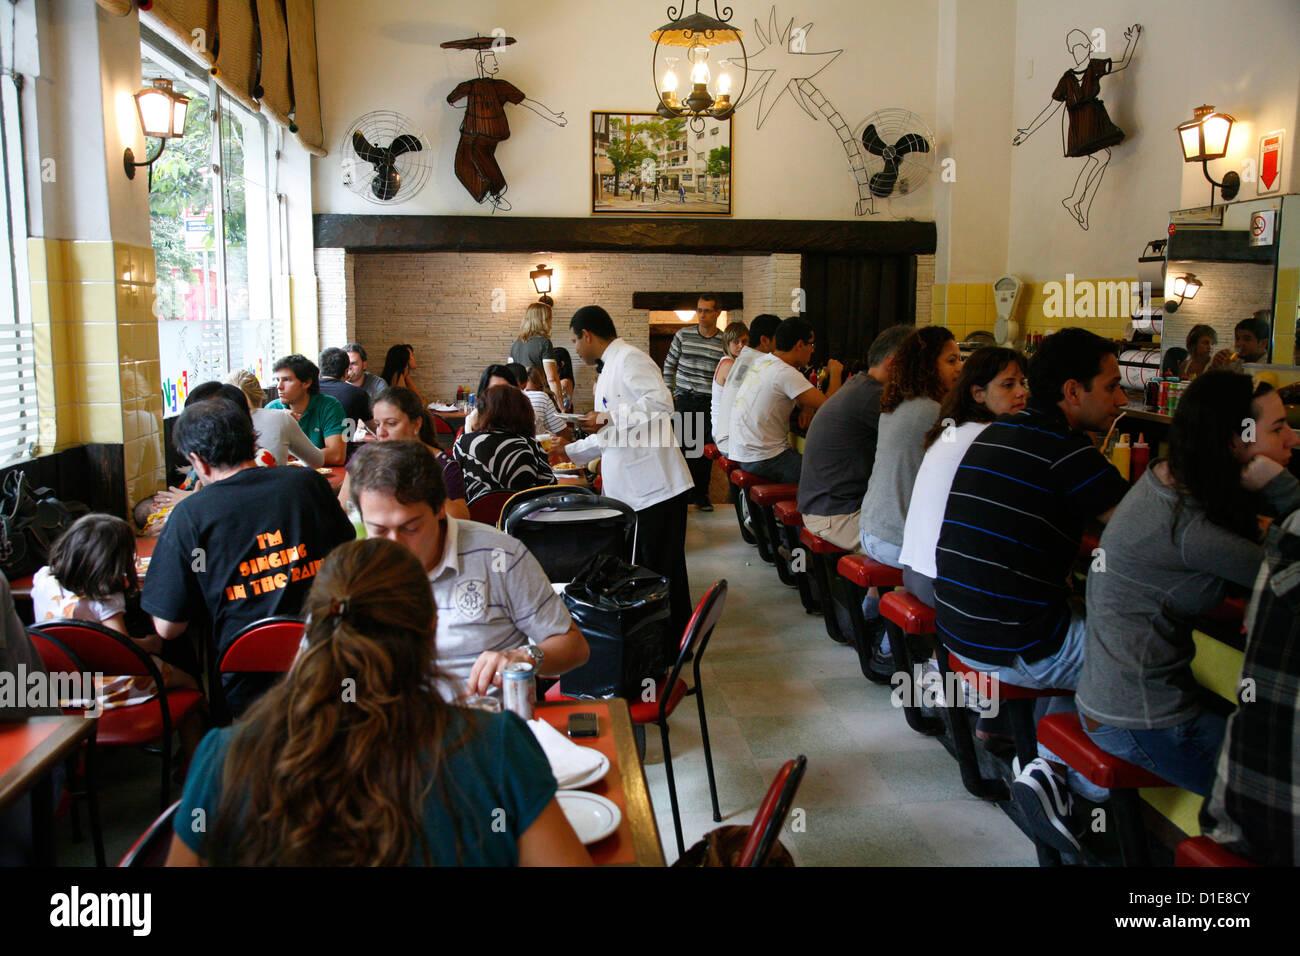 Prevo Bar und Restaurant im Rua Oscar Freire in den Jardins Gegend, Sao Paulo, Brasilien, Südamerika Stockbild